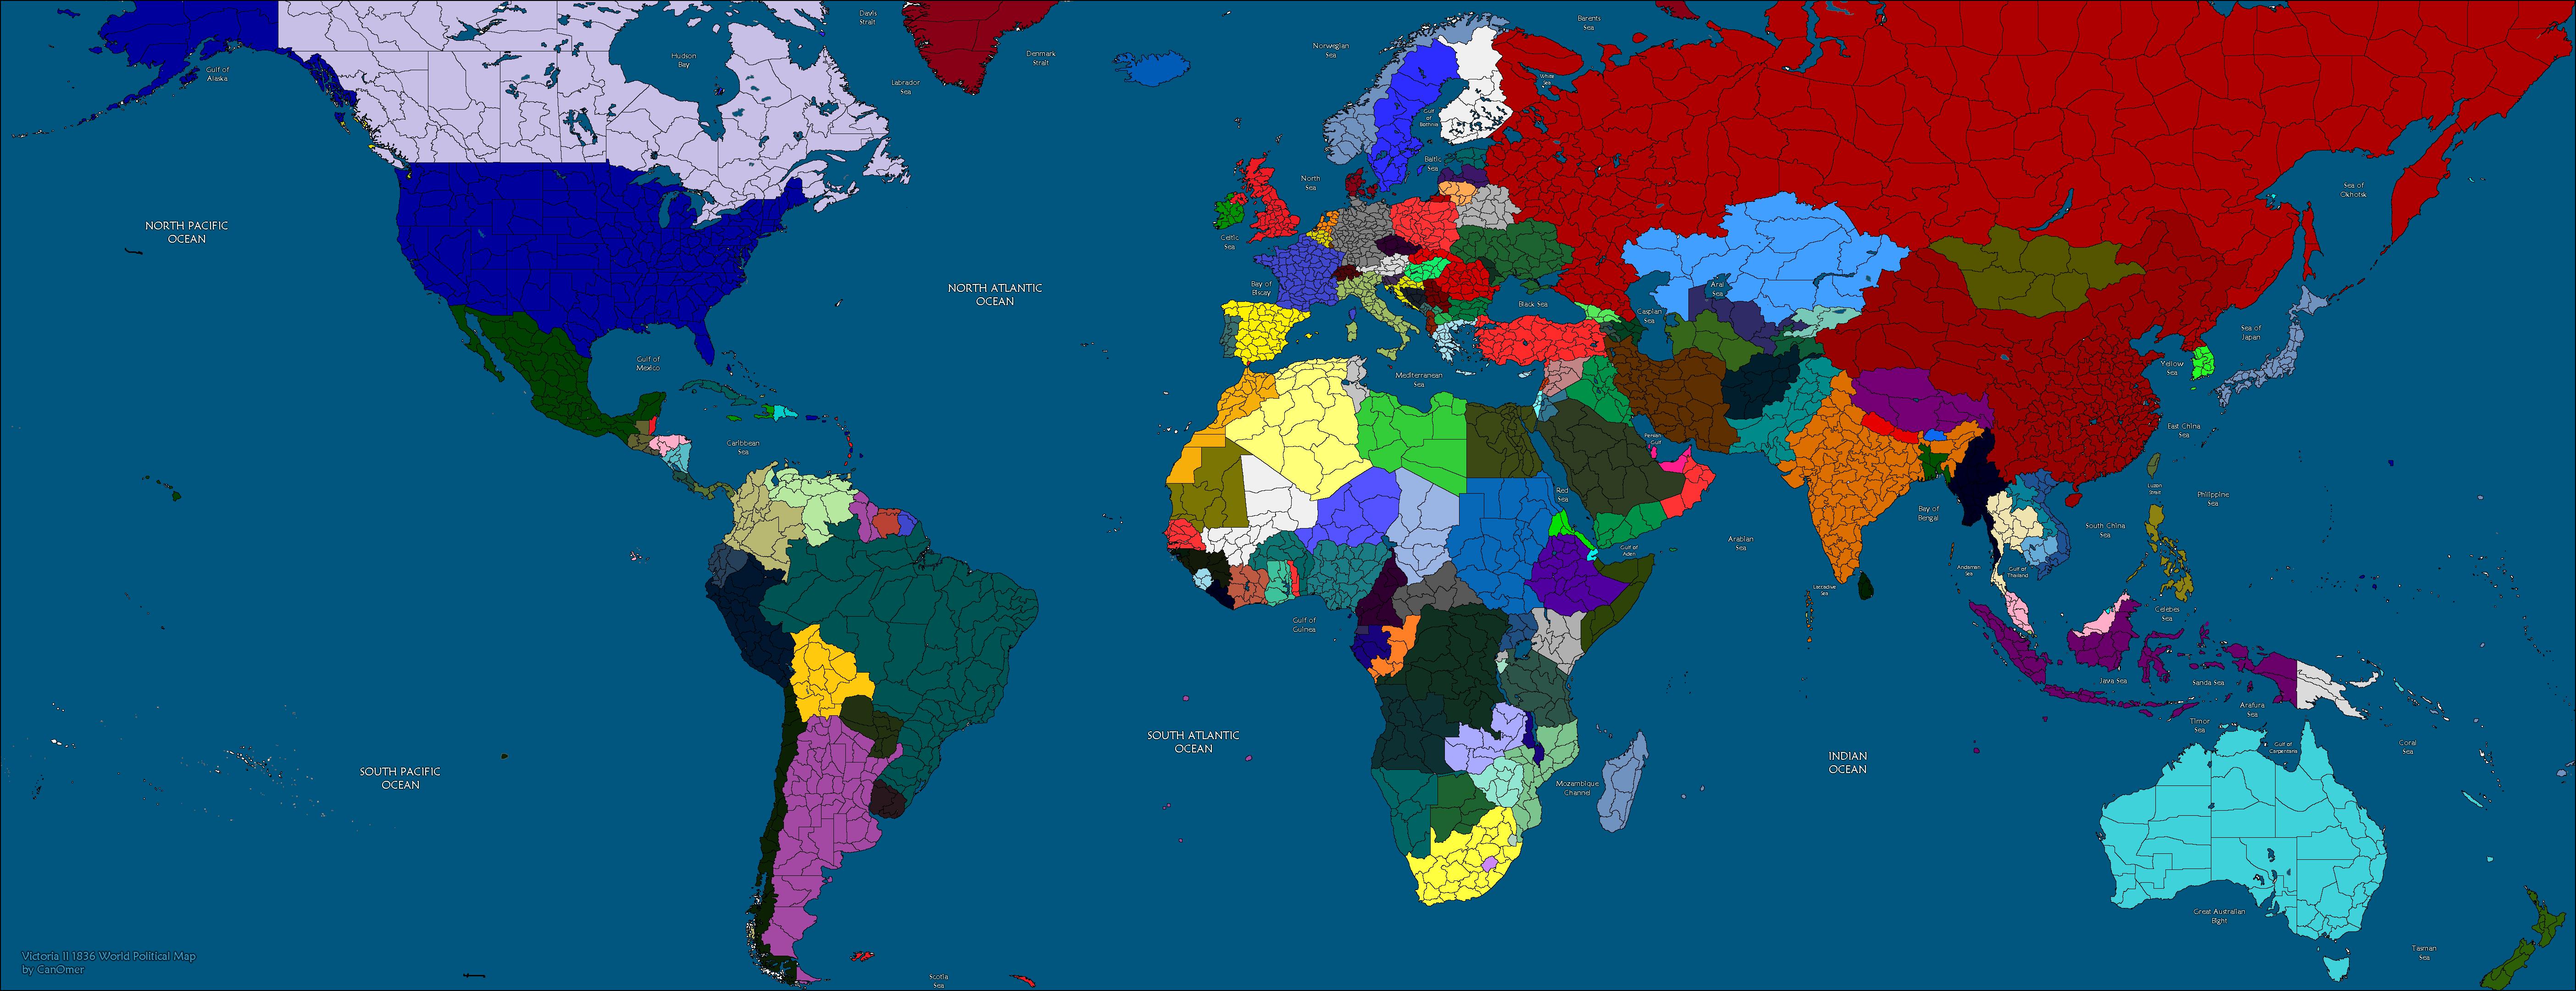 Steam Community Map Of The Modern World In Victoria - Modern world map